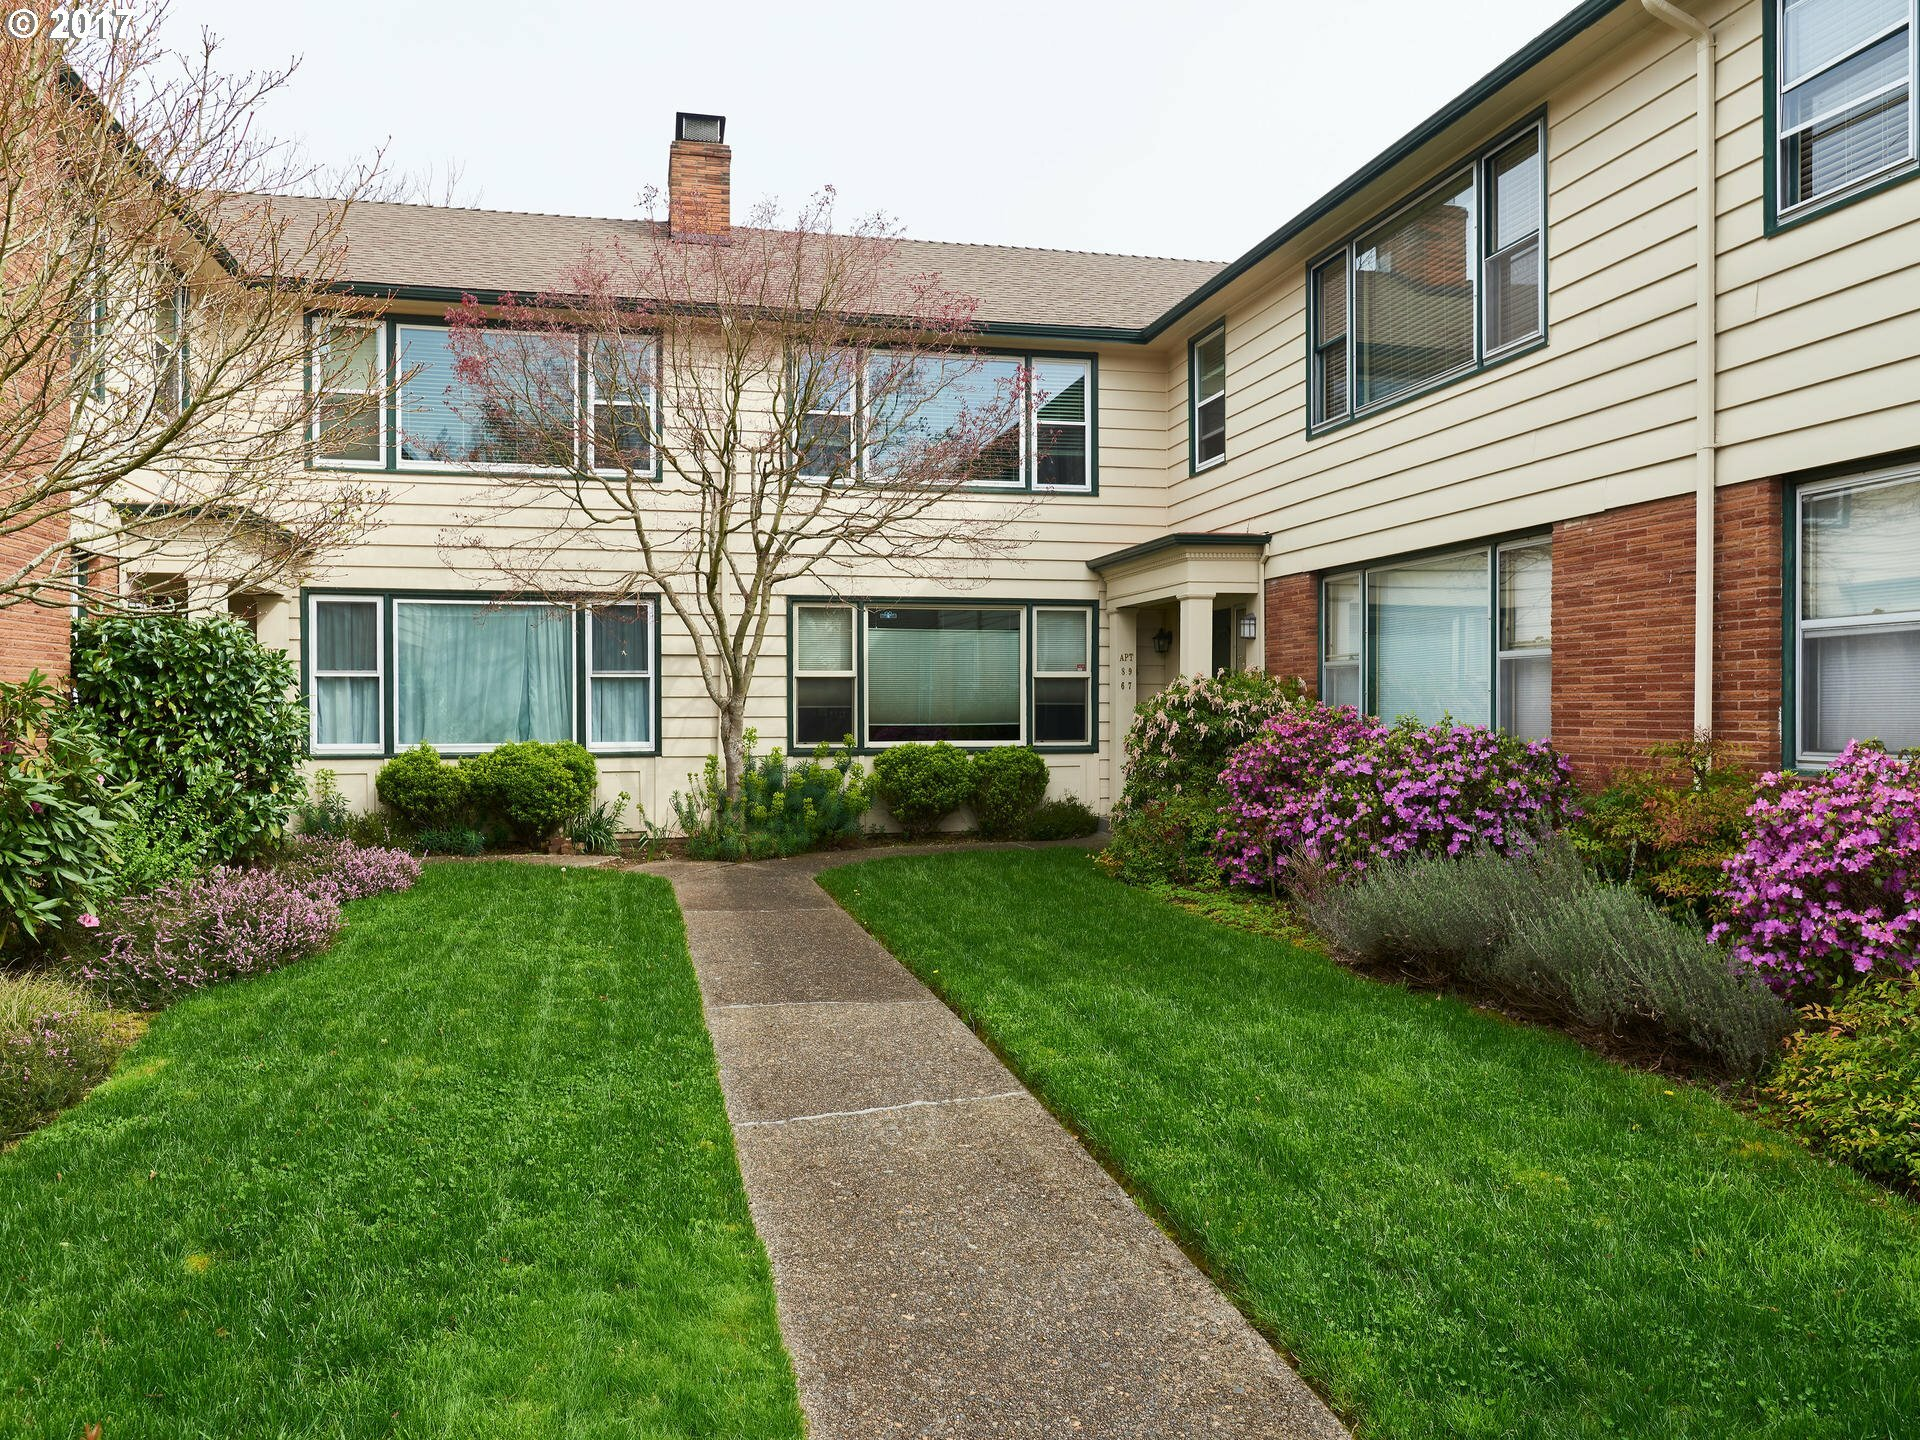 2211 Ne Halsey St 9, Portland, OR - USA (photo 2)